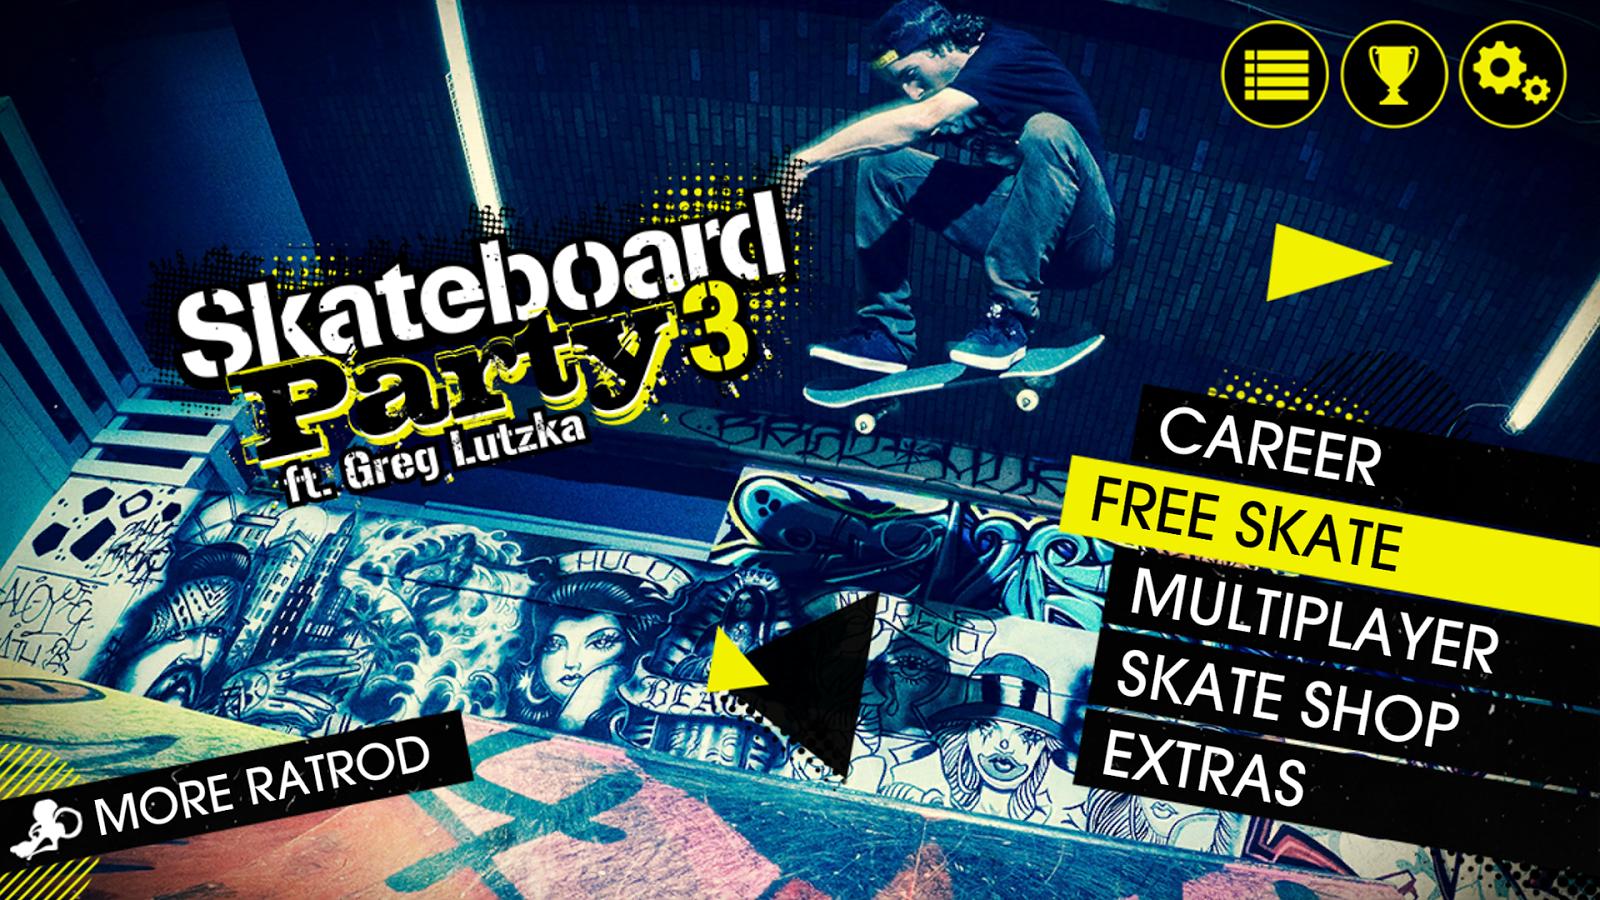 Skateboard Party 3 Greg Lutzka– captură de ecran